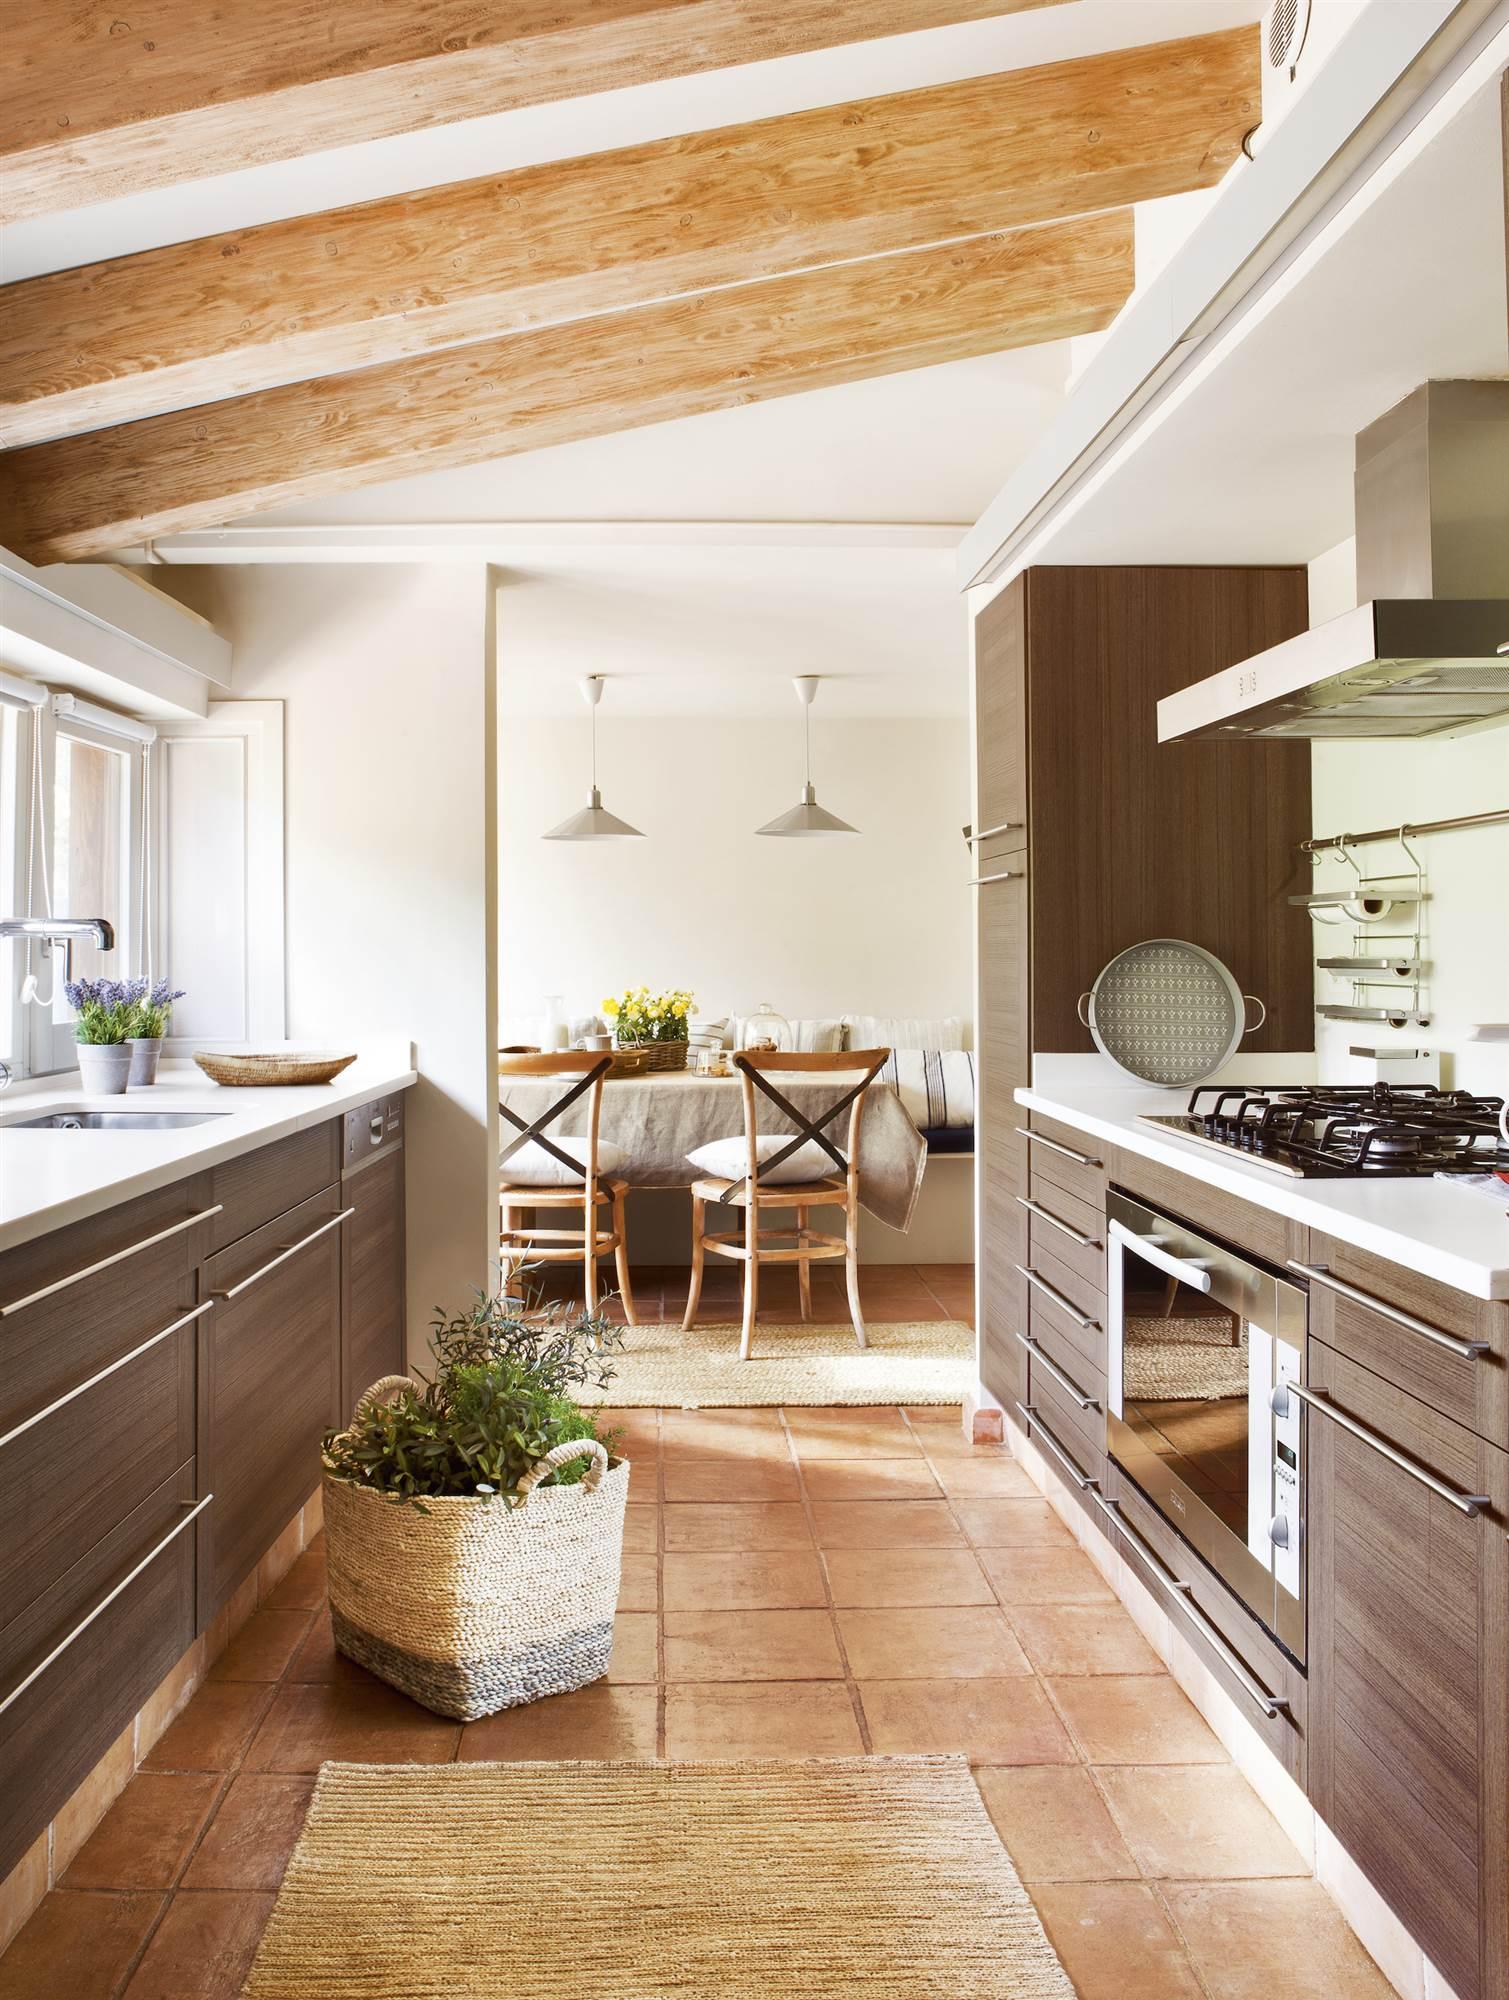 2147 fotos de cocinas for Cocina de madera antracita